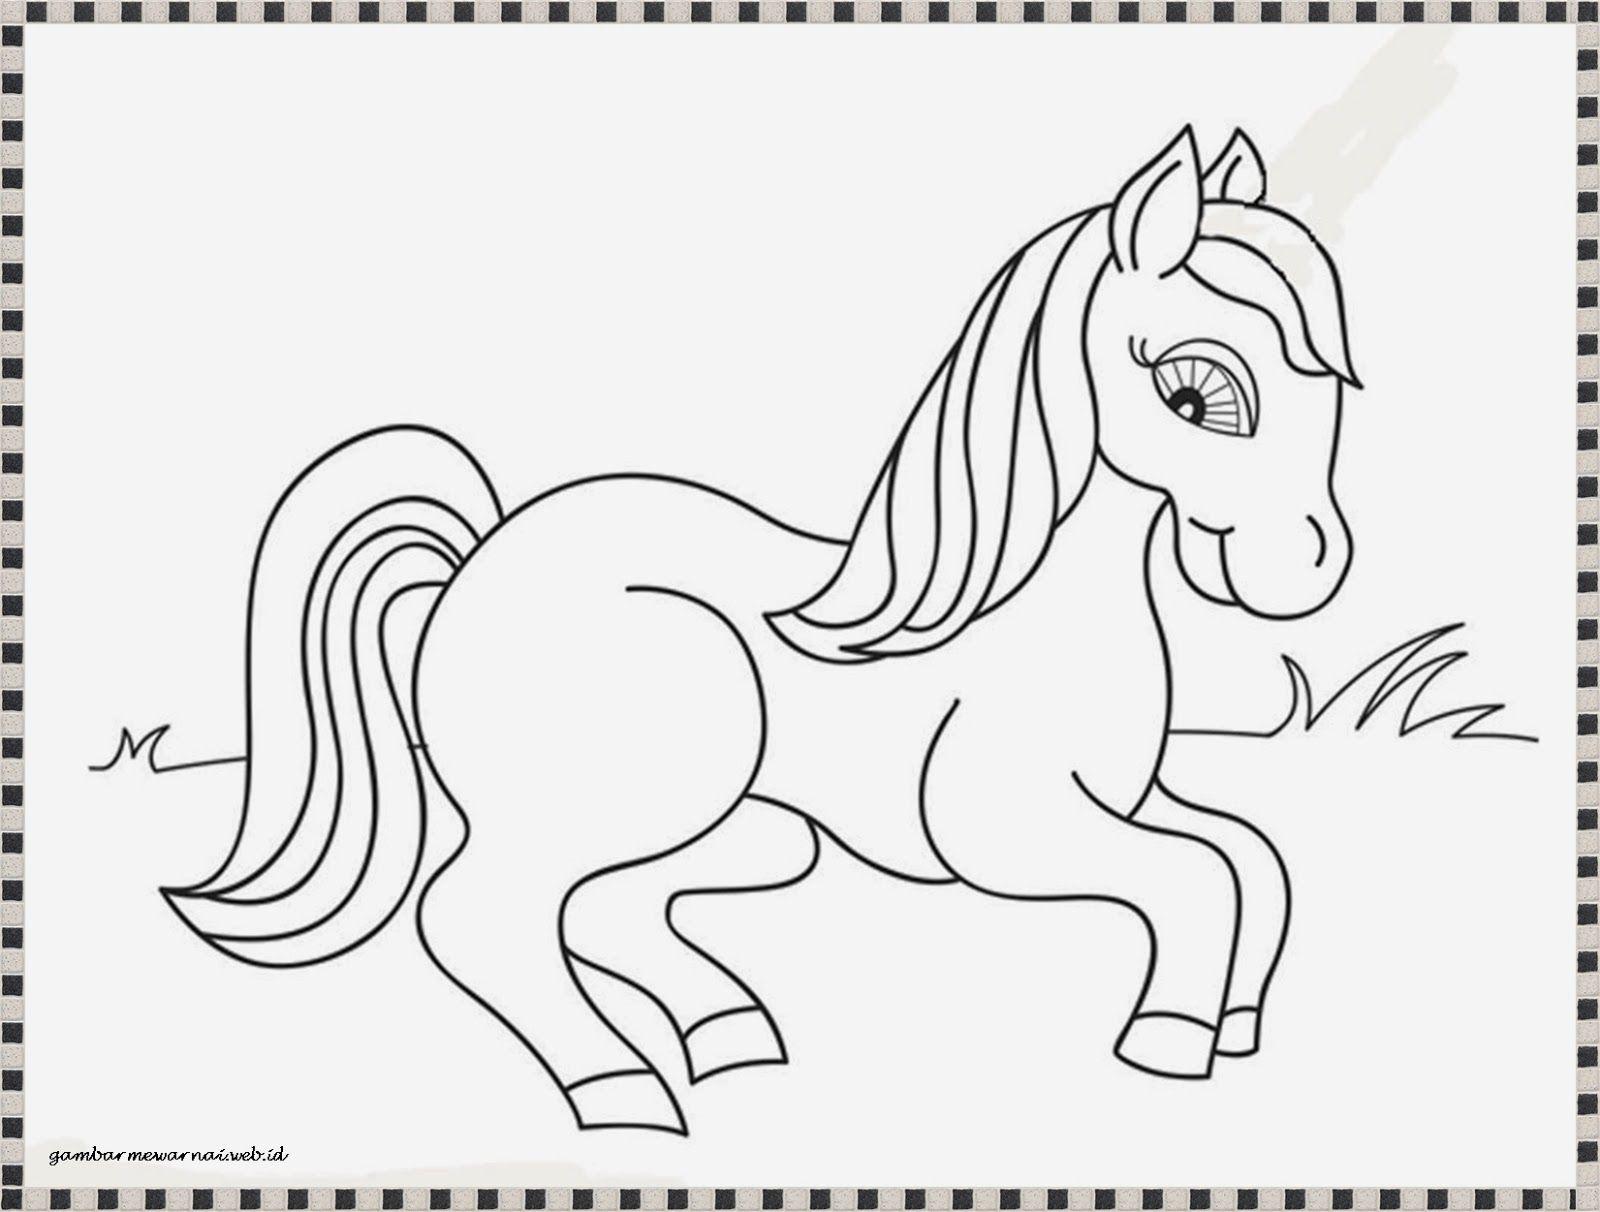 Mewarnai Gambar Anak Kuda Poni Yang Lucu Kuda Poni Buku Mewarnai Kuda